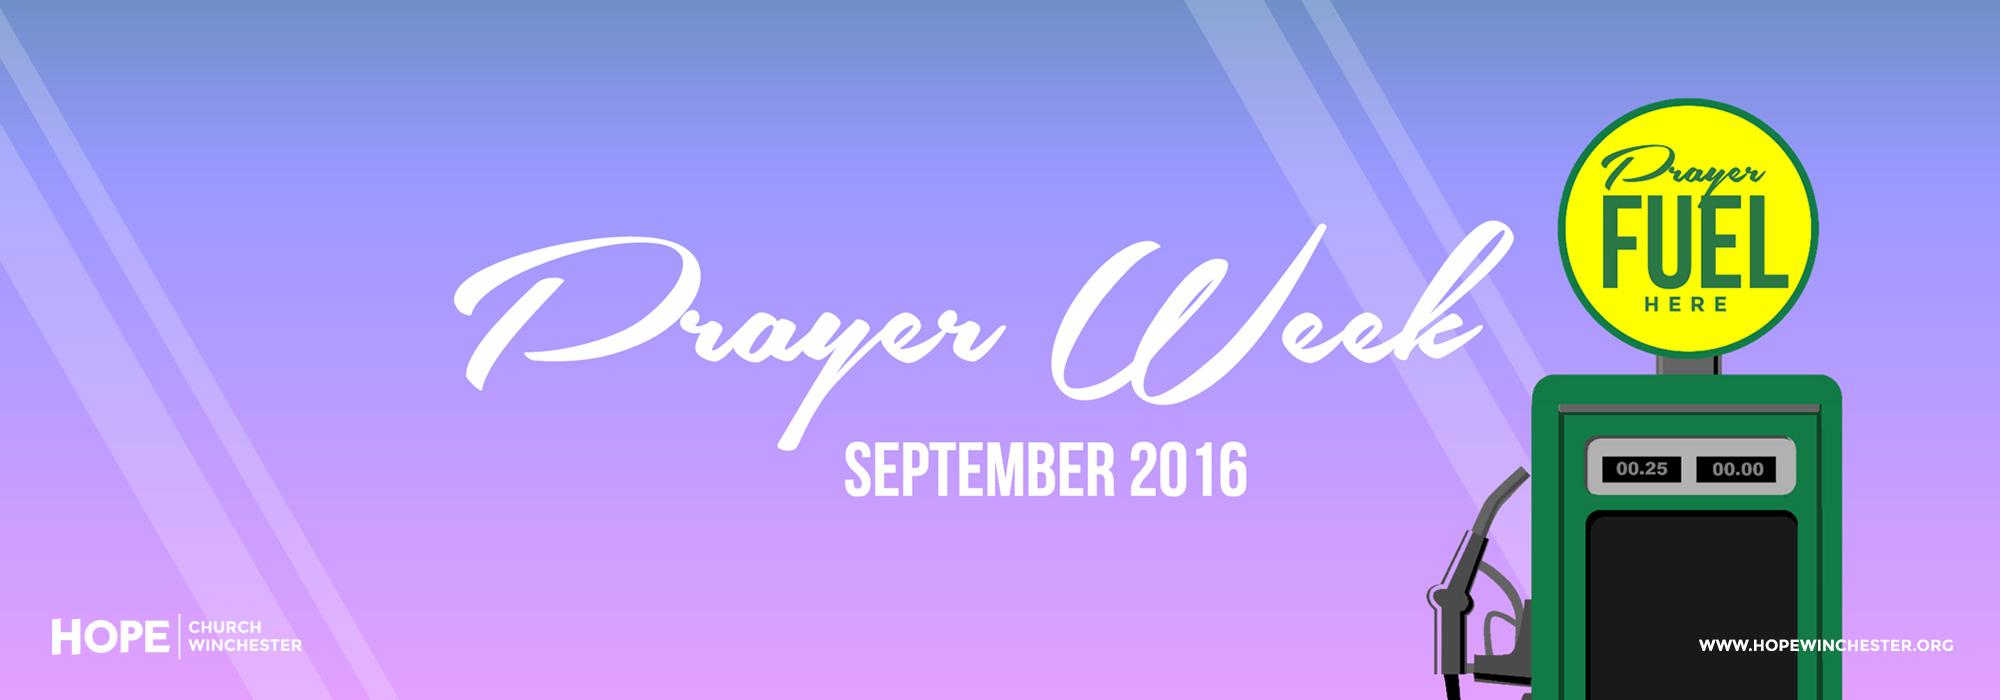 W-Events-PrayerWk-Sept2016